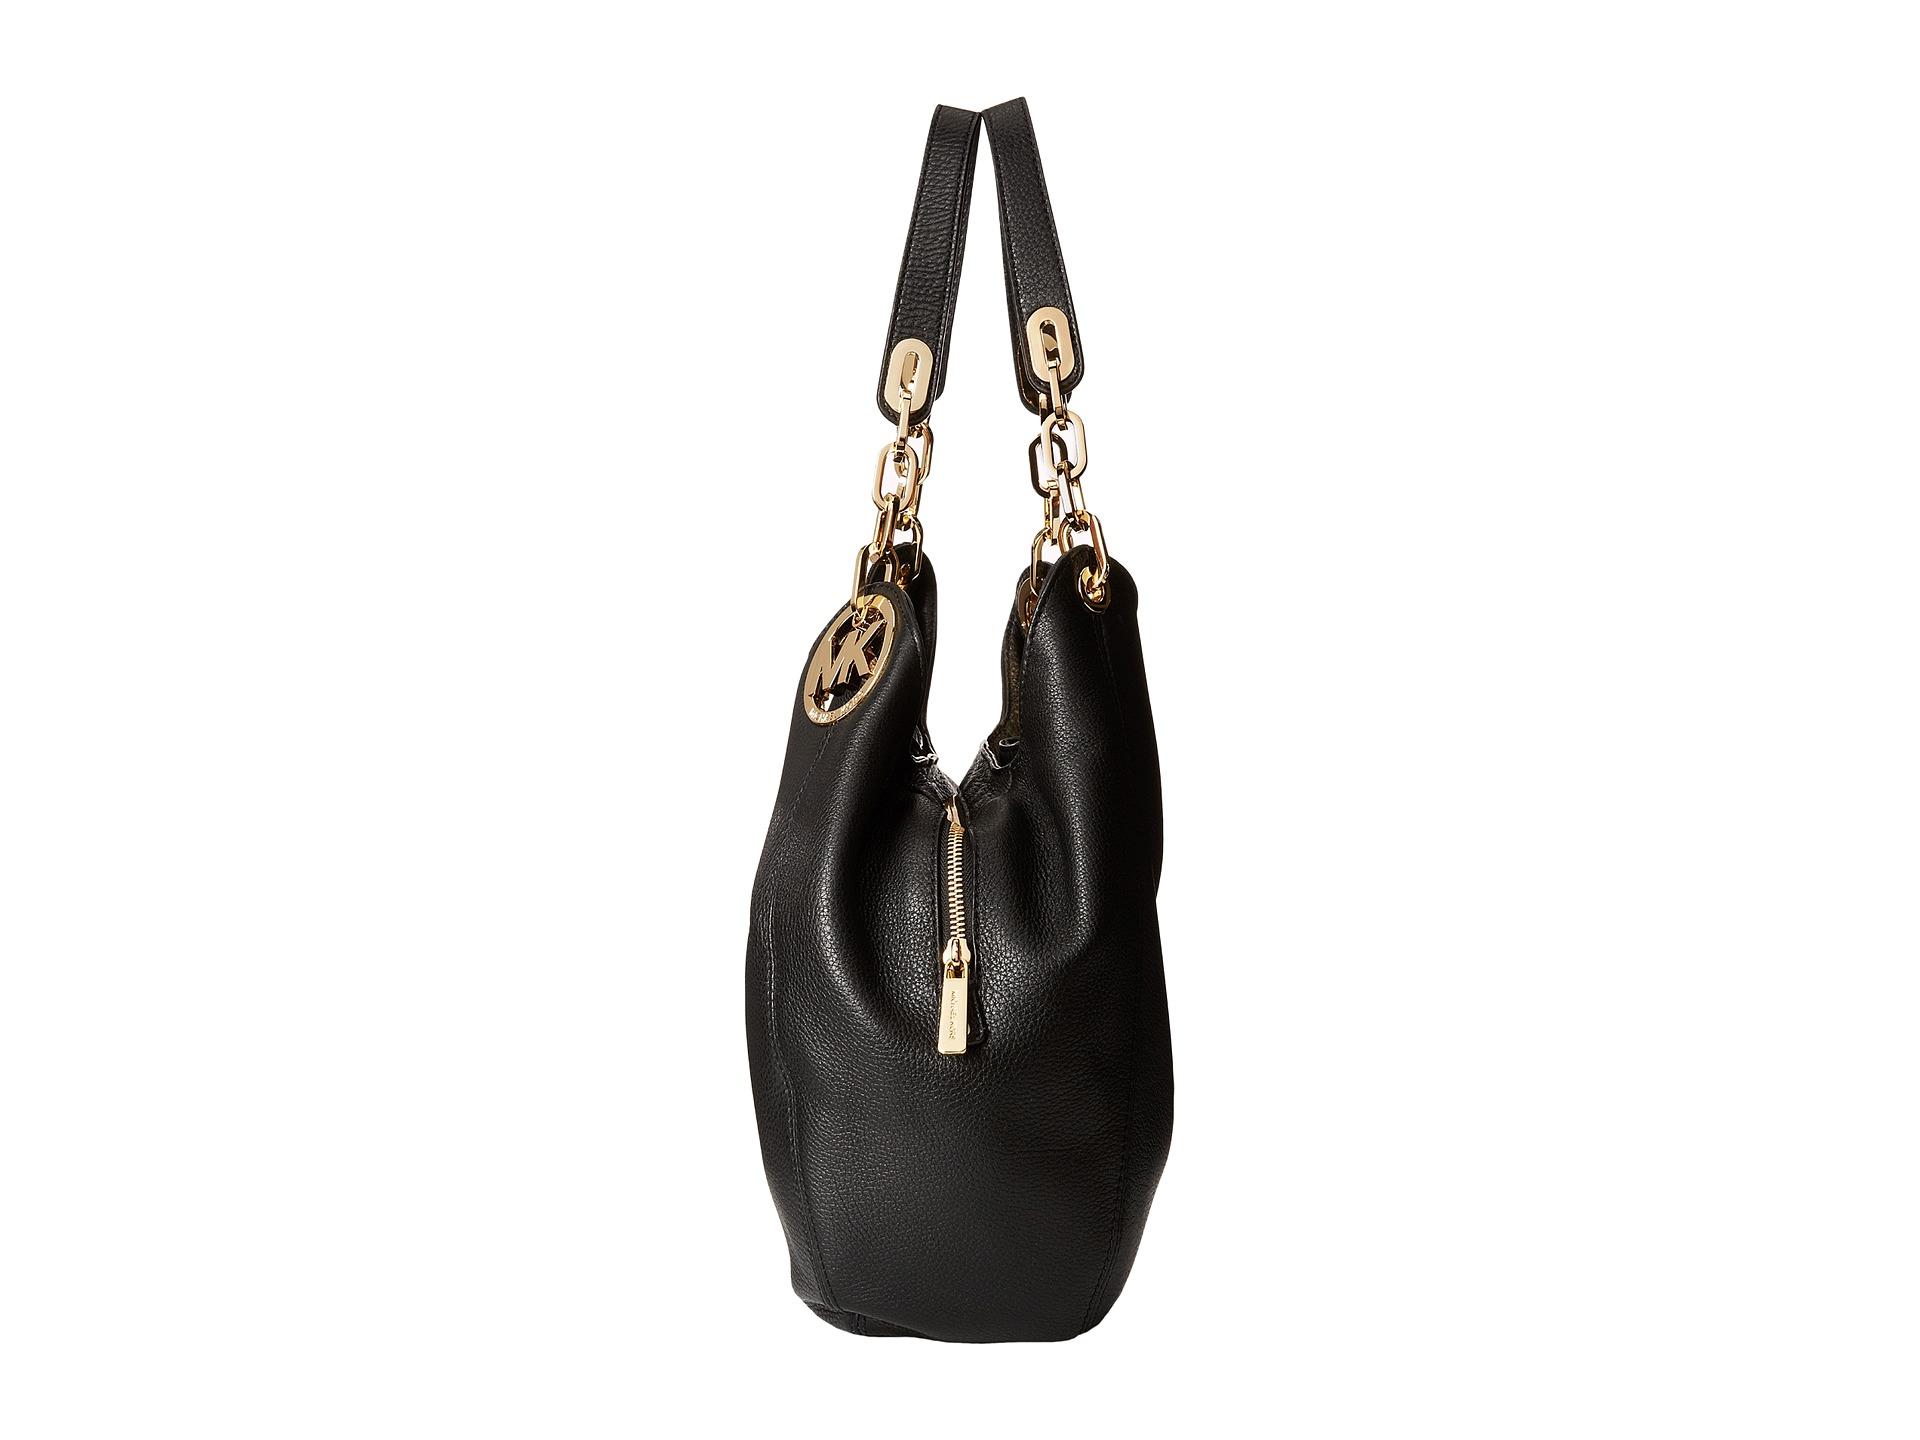 421acbbfd35f michael kors handbag fulton large shoulder tote sale   OFF44% Discounted